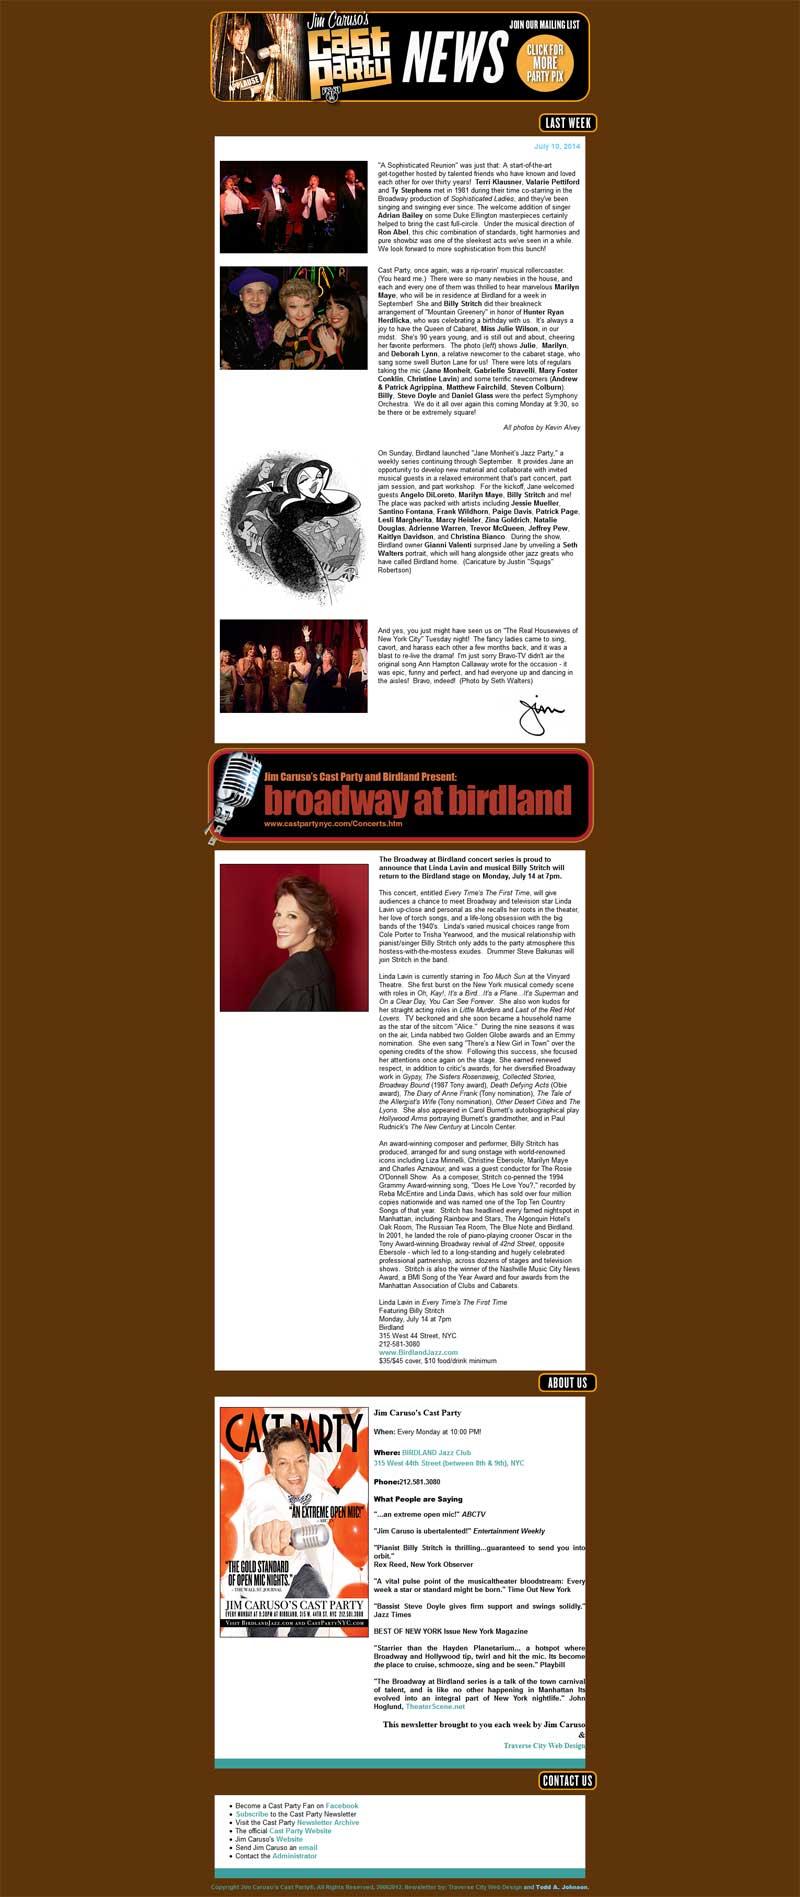 Michigan Email Marketing for Birdland Jazz Club in New York City